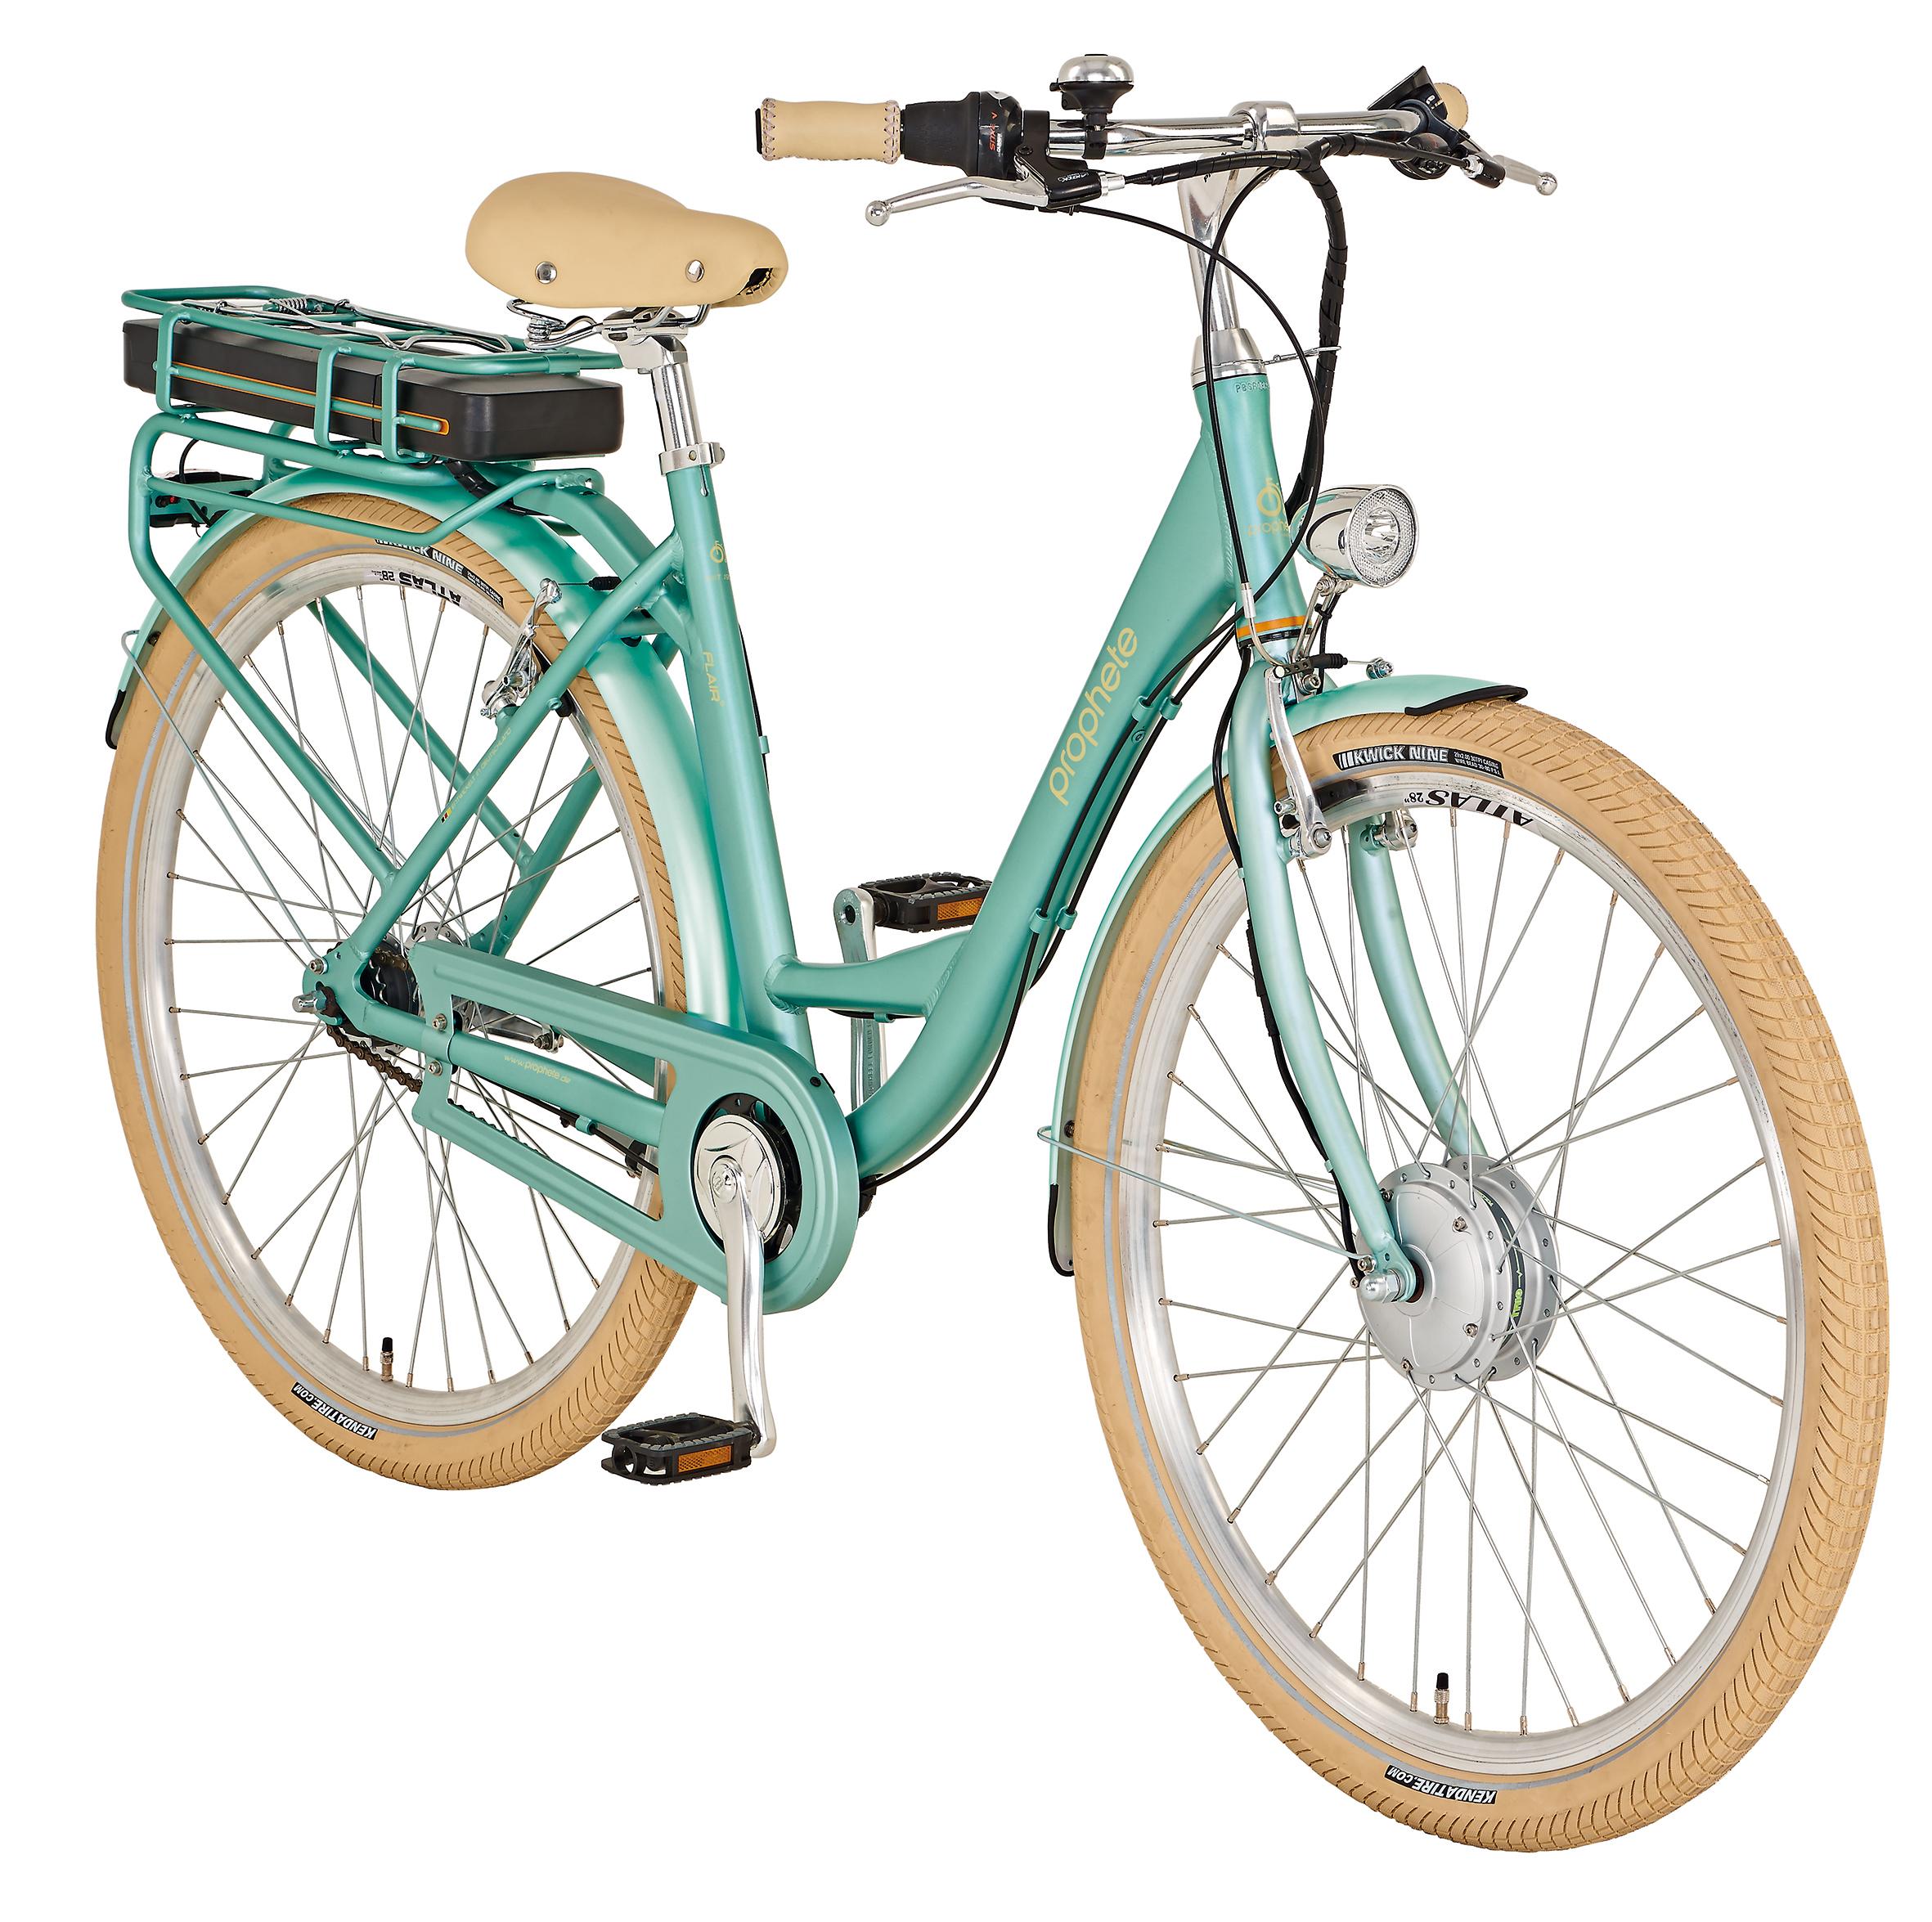 "Prophete Elektrofahrrad / E-Bike Geniesser e9.1 City E-Bike 28"" polar Bild 2"